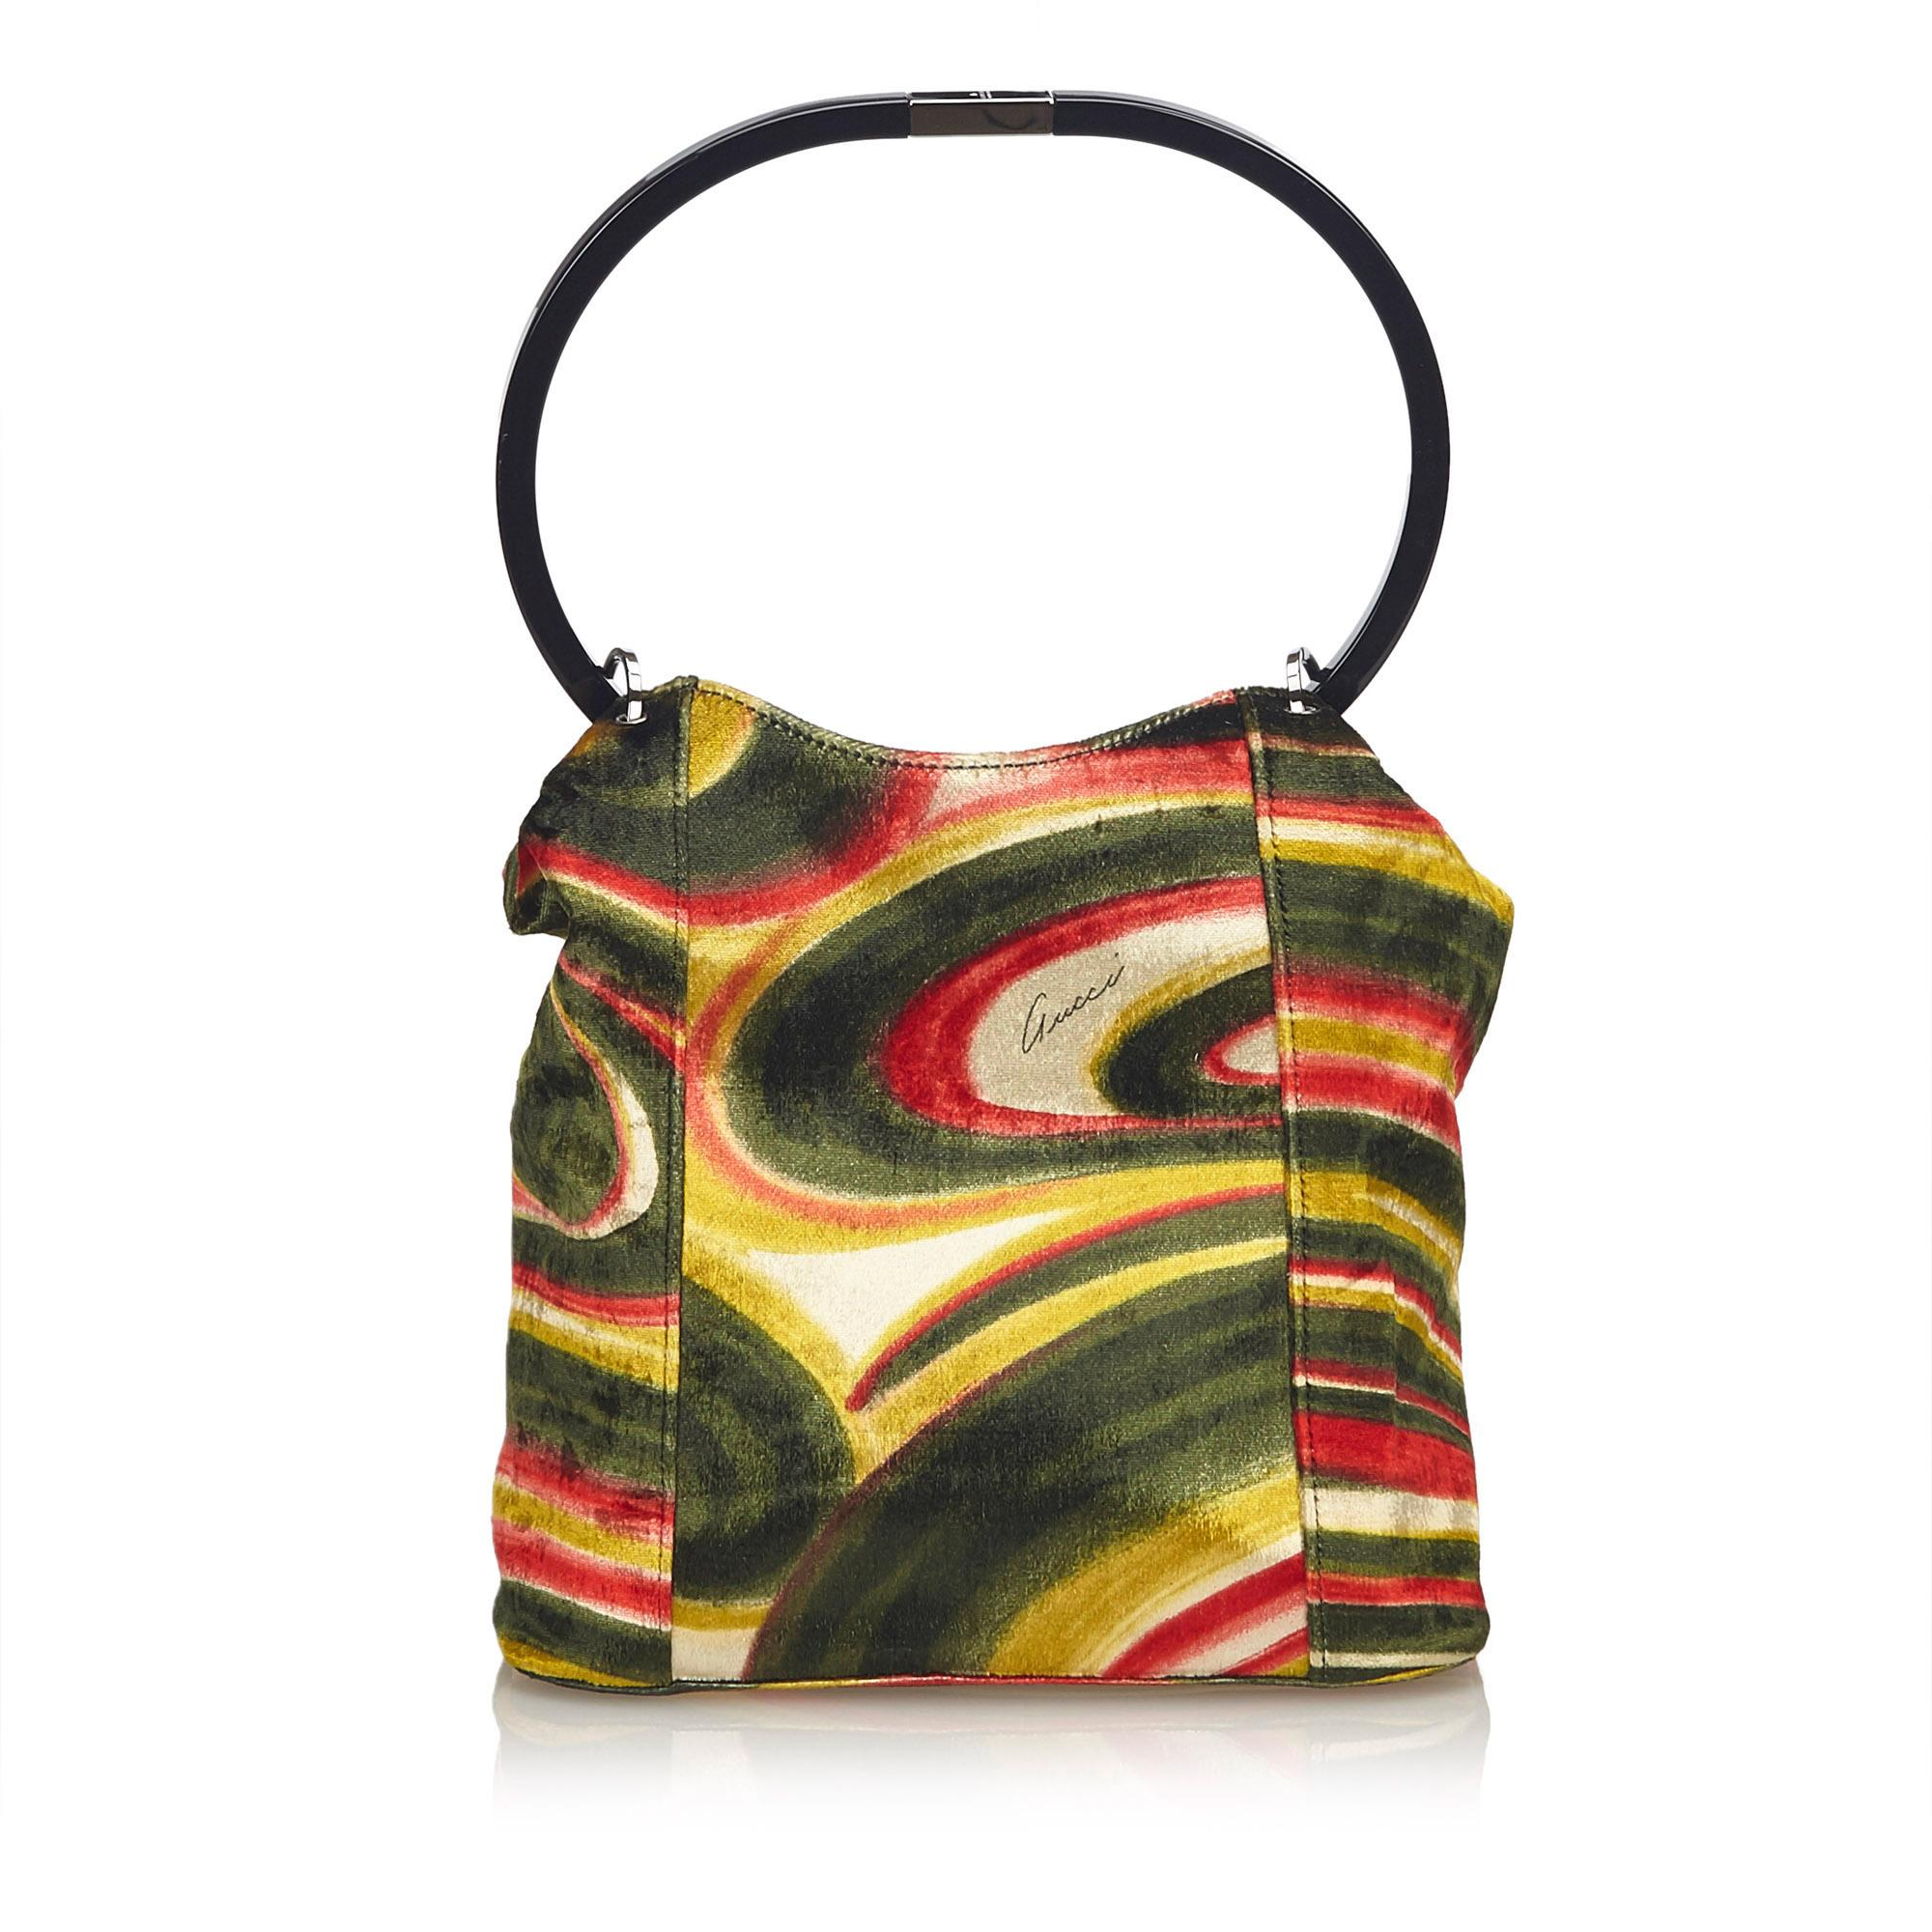 b12f905ae453e0 Gucci Green Graphic Print Velour Handbag at 1stdibs